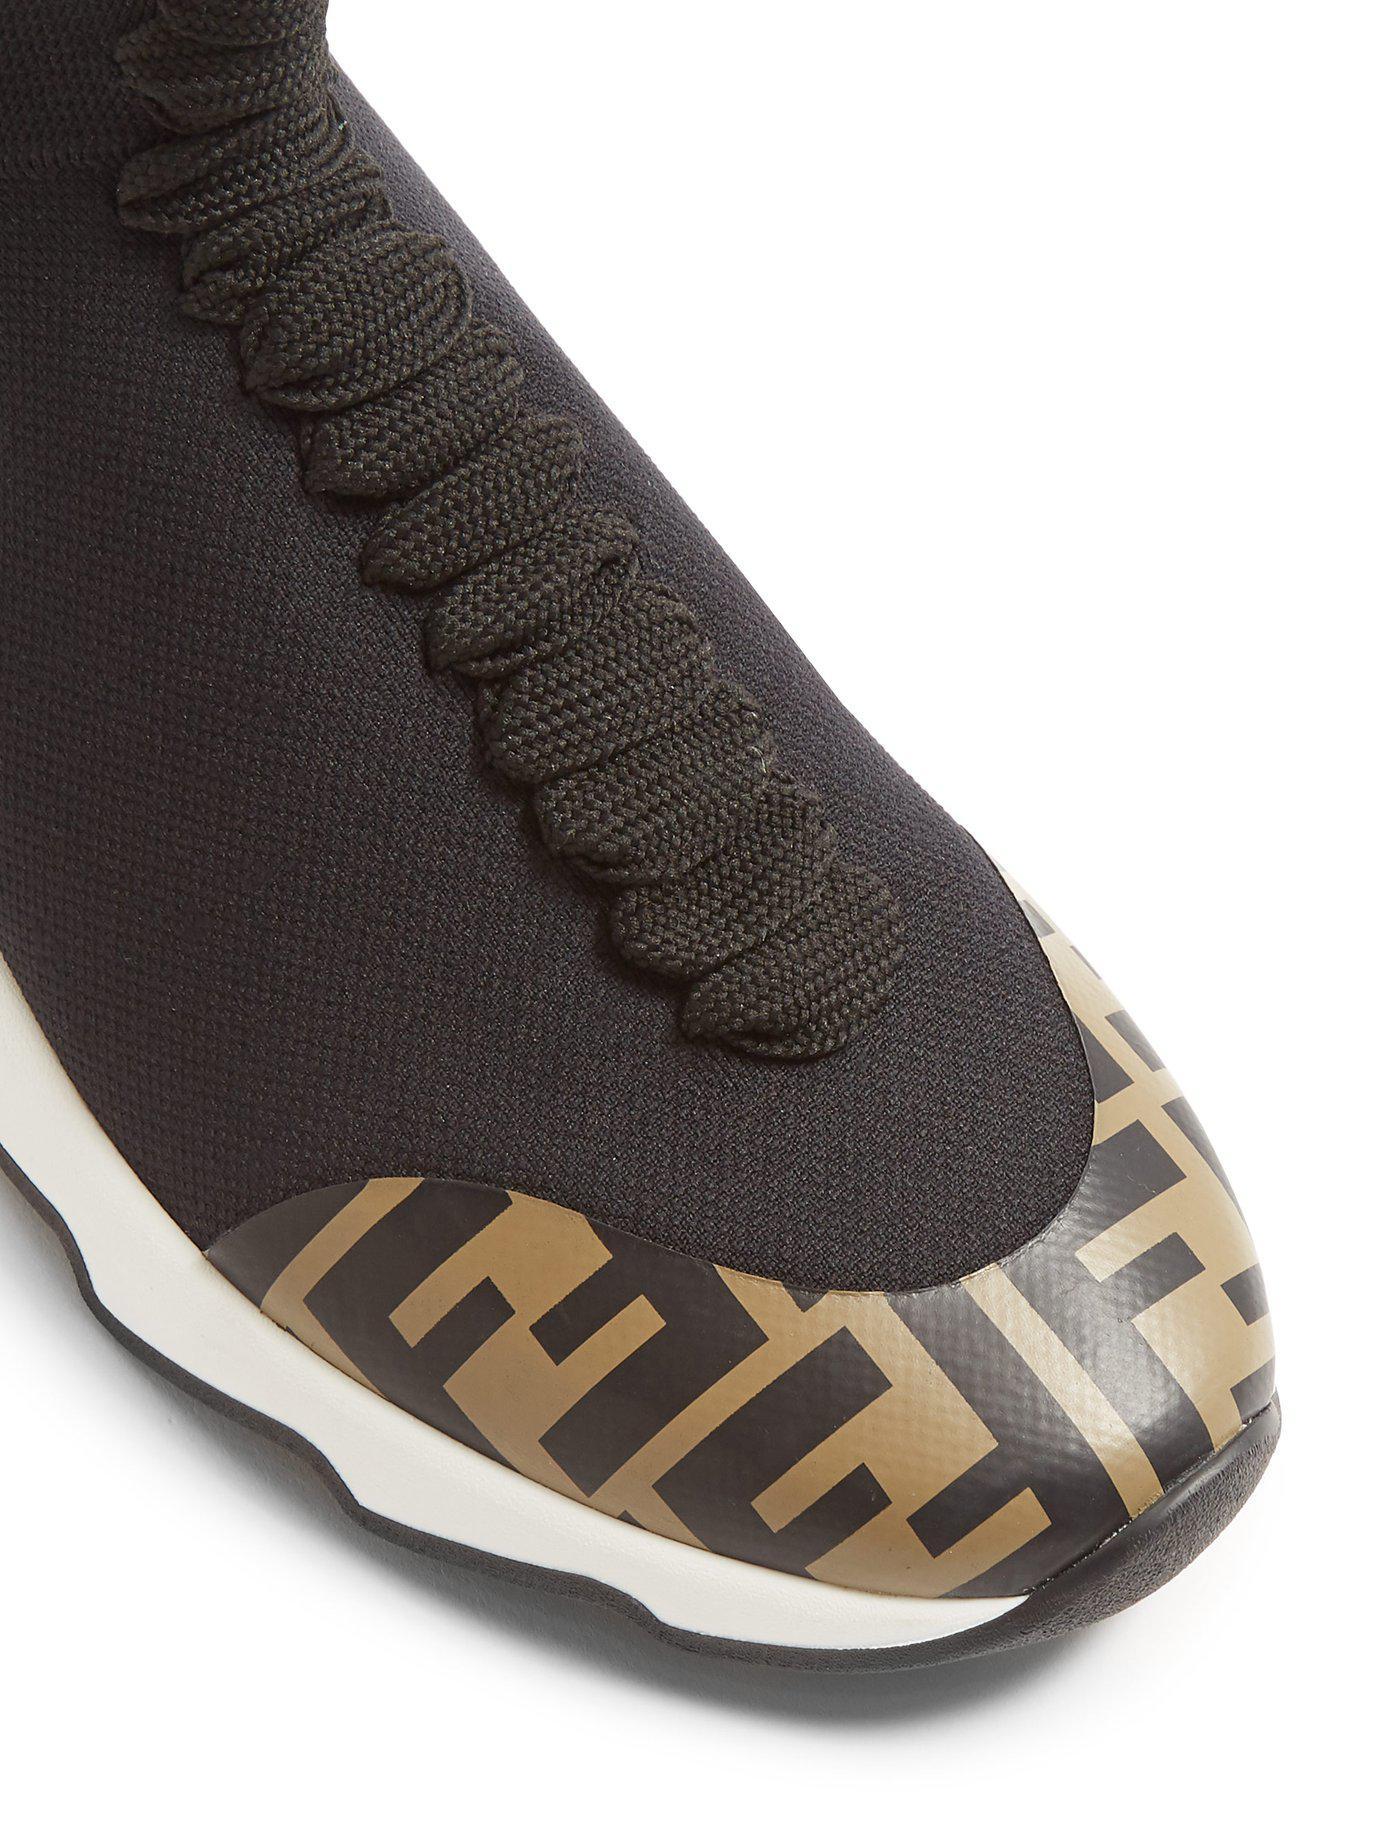 746e4fd222d0 Lyst - Fendi Ff Mid-top Sock Sneakers in Black - Save 20%